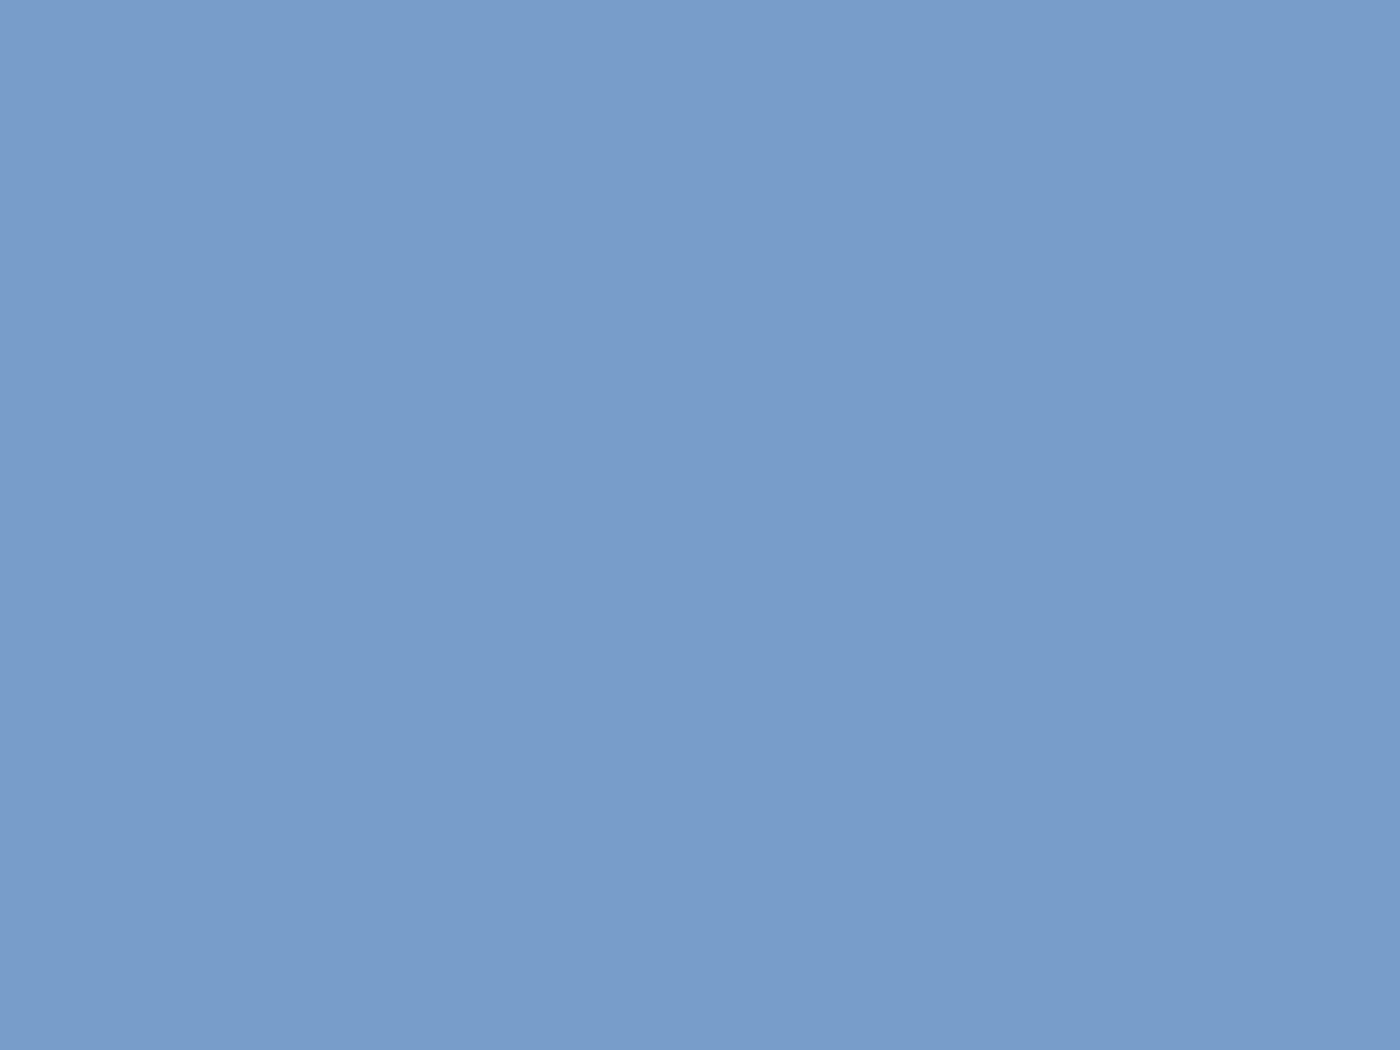 1400x1050 Dark Pastel Blue Solid Color Background